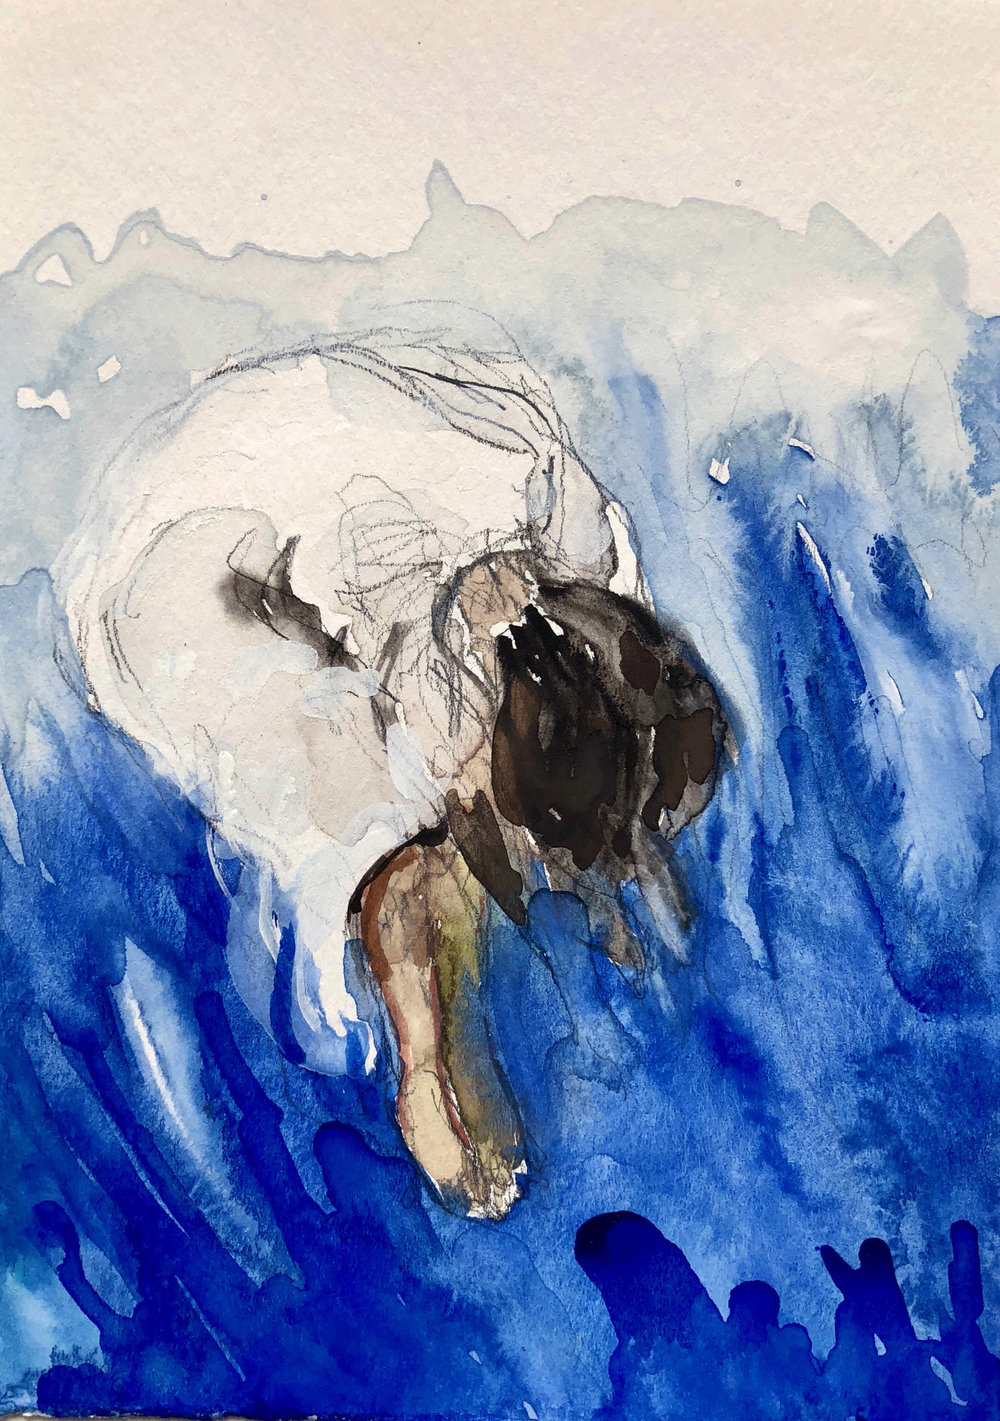 Soñador de Onda (Wave Dreamer), 2018,  Graphite and watercolor on paper, 7 1/2 x 5 in.